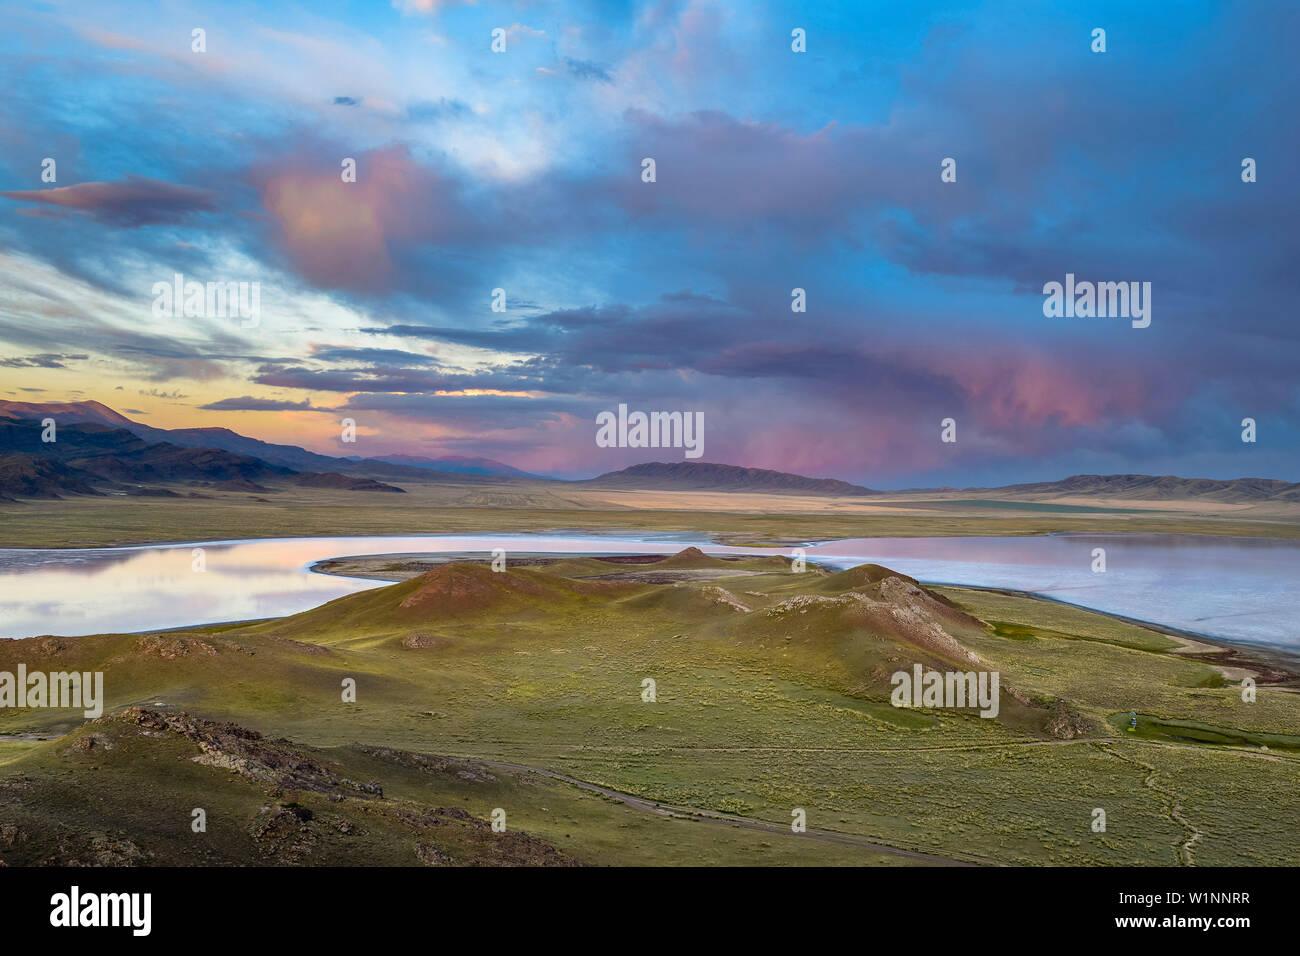 Sunset over steppe and mountain landscape, Tuzkoel Salt Lake, Tuzkol, Tien Shan, Tian Shan, Almaty region, Kazakhstan, Central Asia, Asia Stock Photo